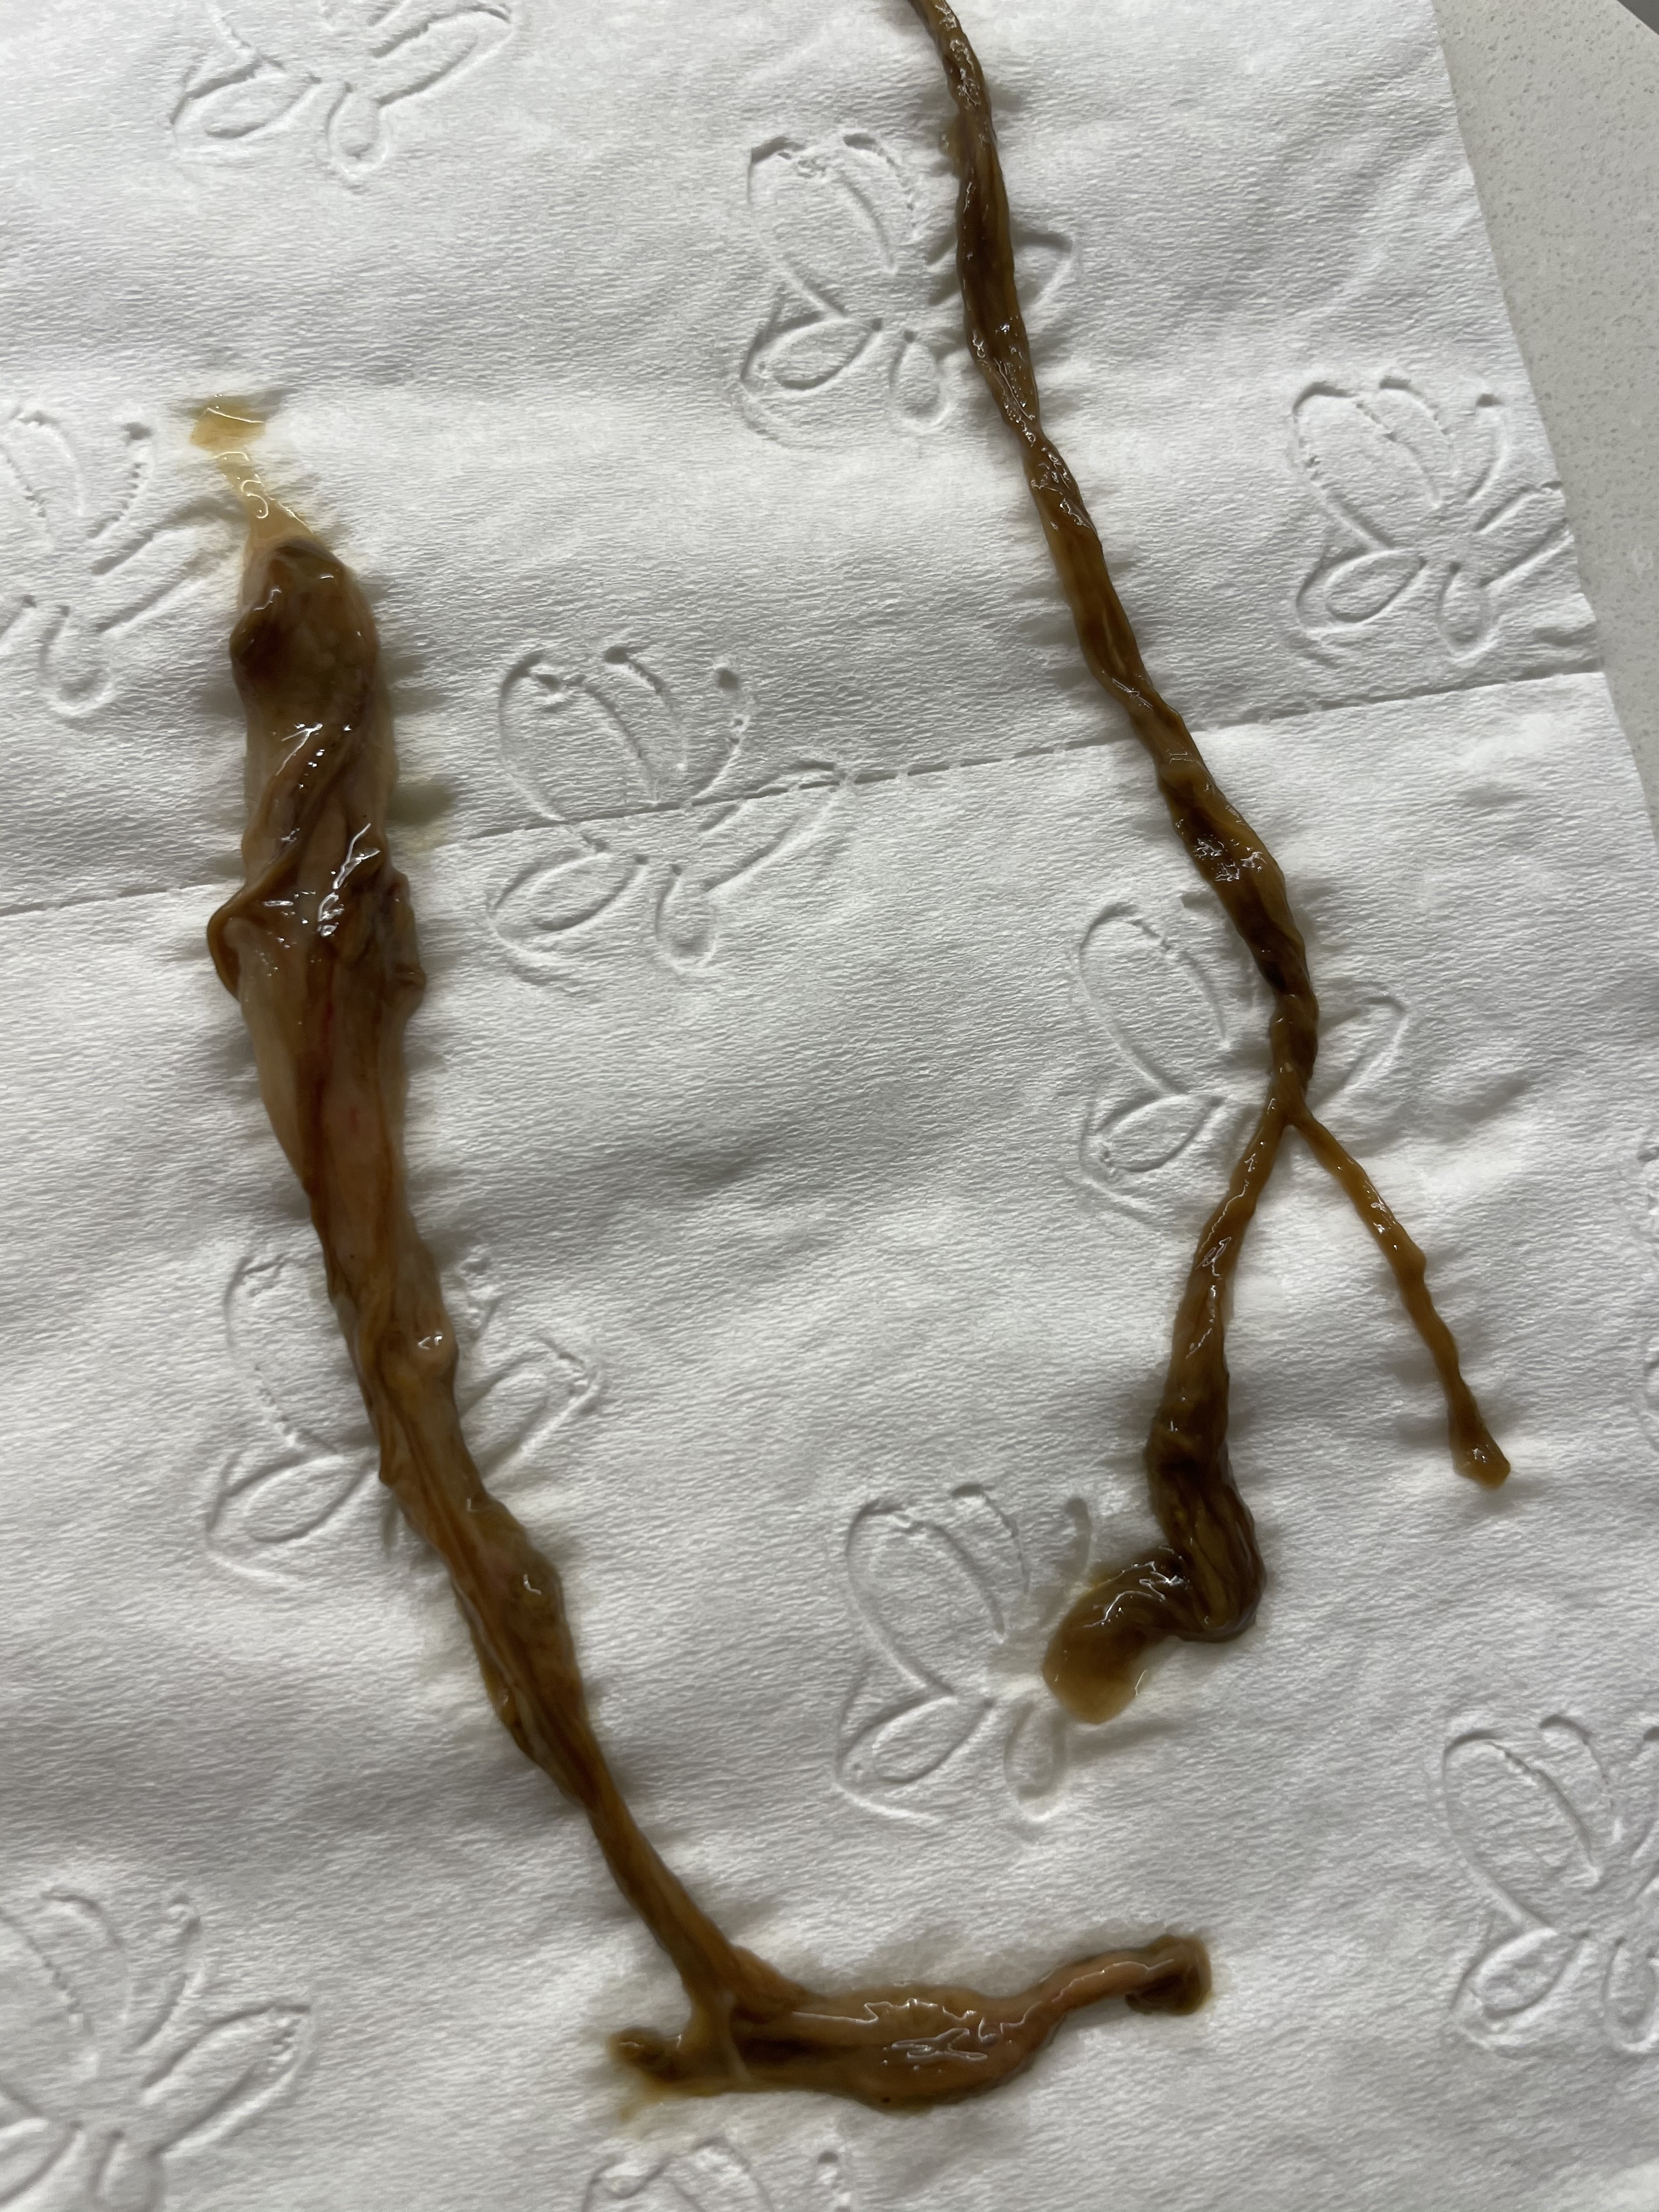 https://www.curezone.org/upload/Parasites/parasite25.jpg